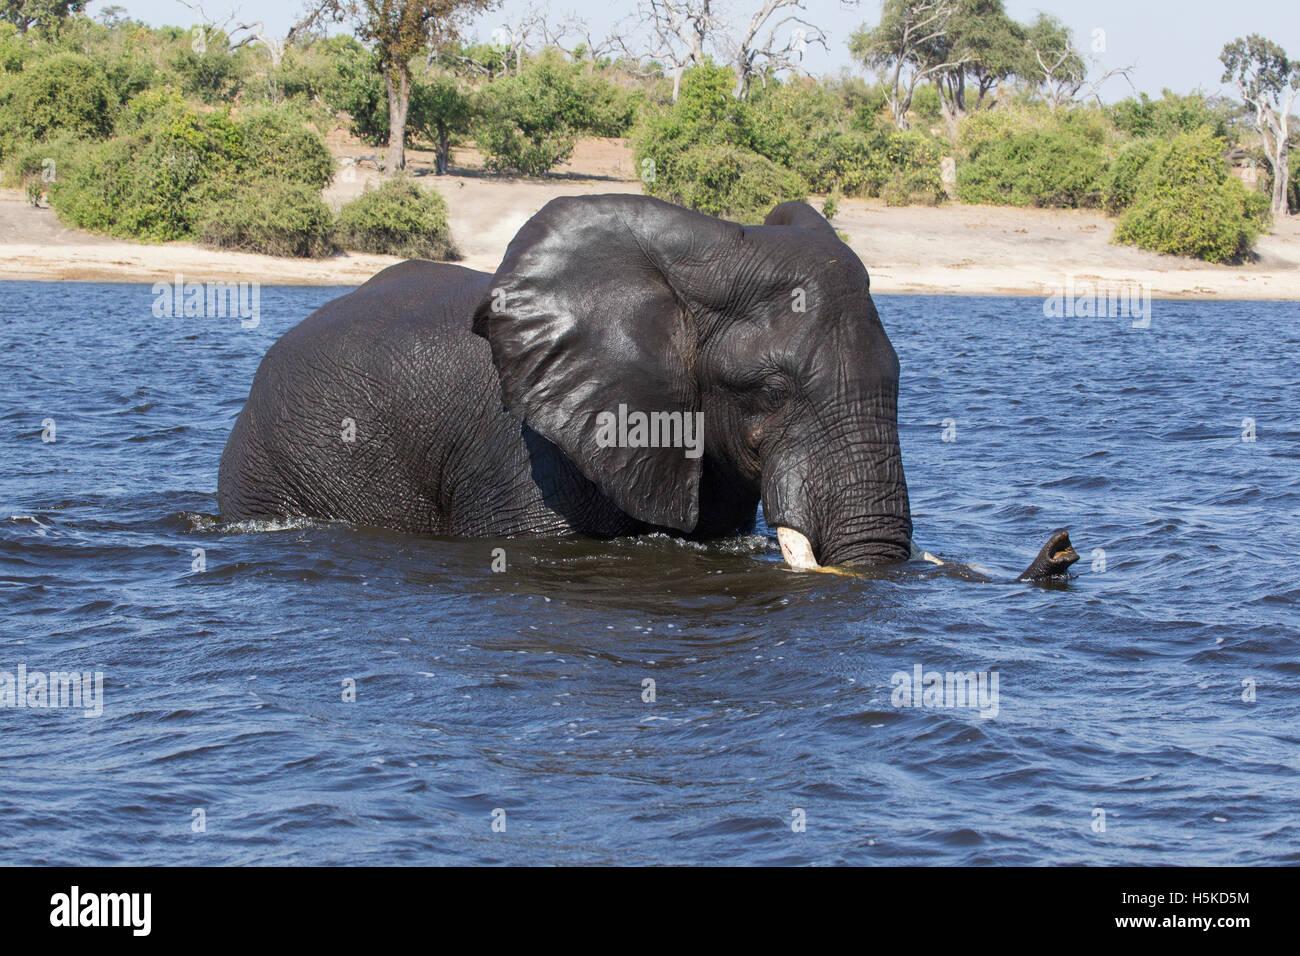 Large African elephant Loxodonta africana wading across the Chobe river in Boswana - Stock Image